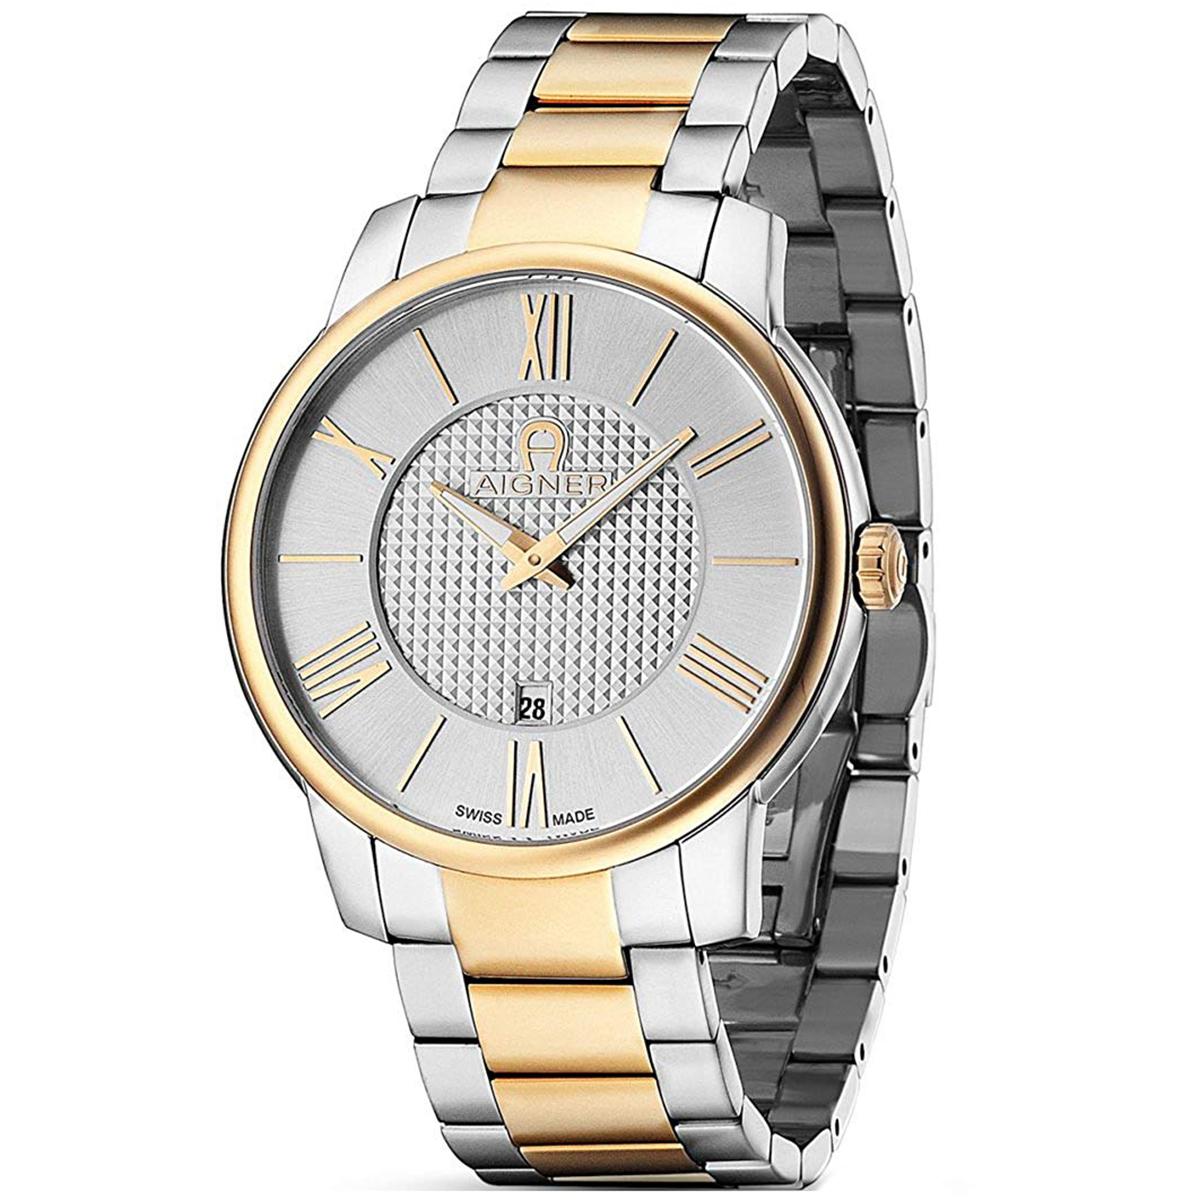 ساعت مچی عقربه ای مردانه اگنر مدل A24057 13